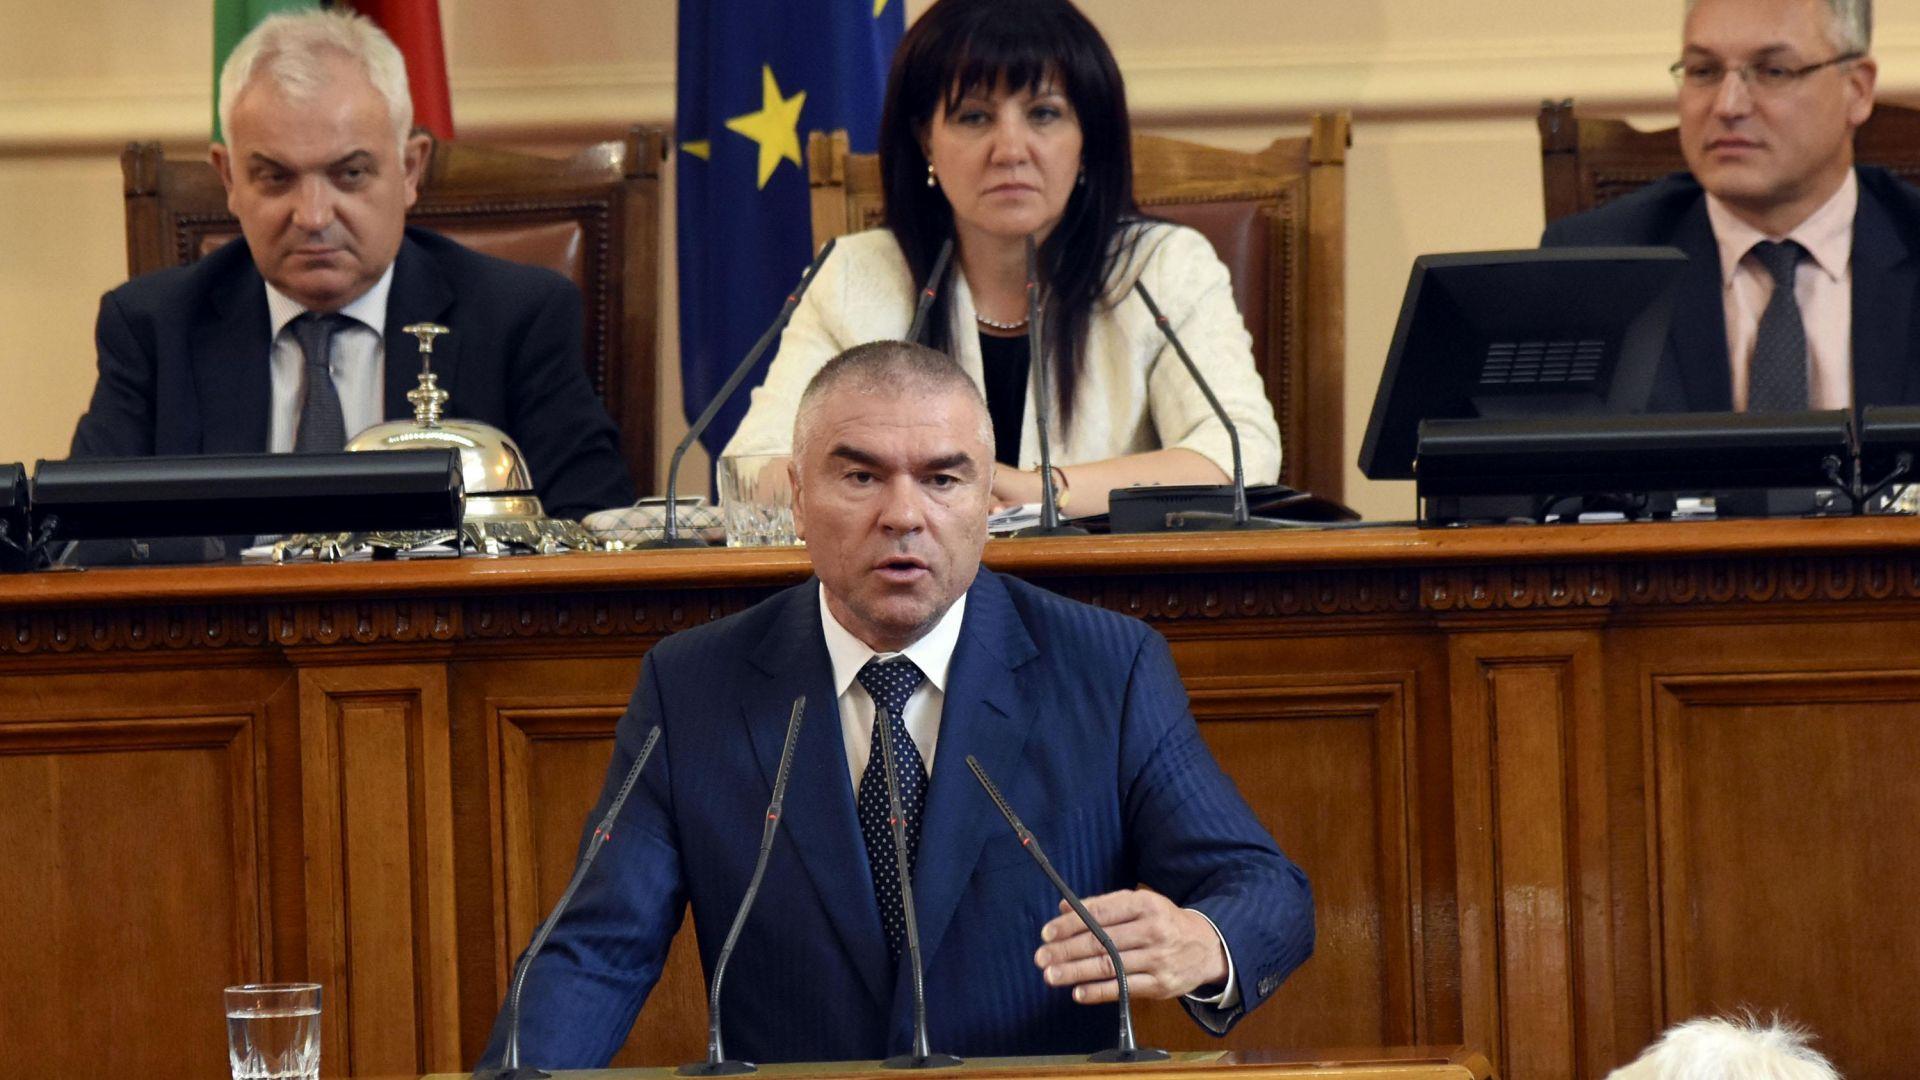 Марешки: Призоваваме Борисов да гласува против санкциите срещу Унгария